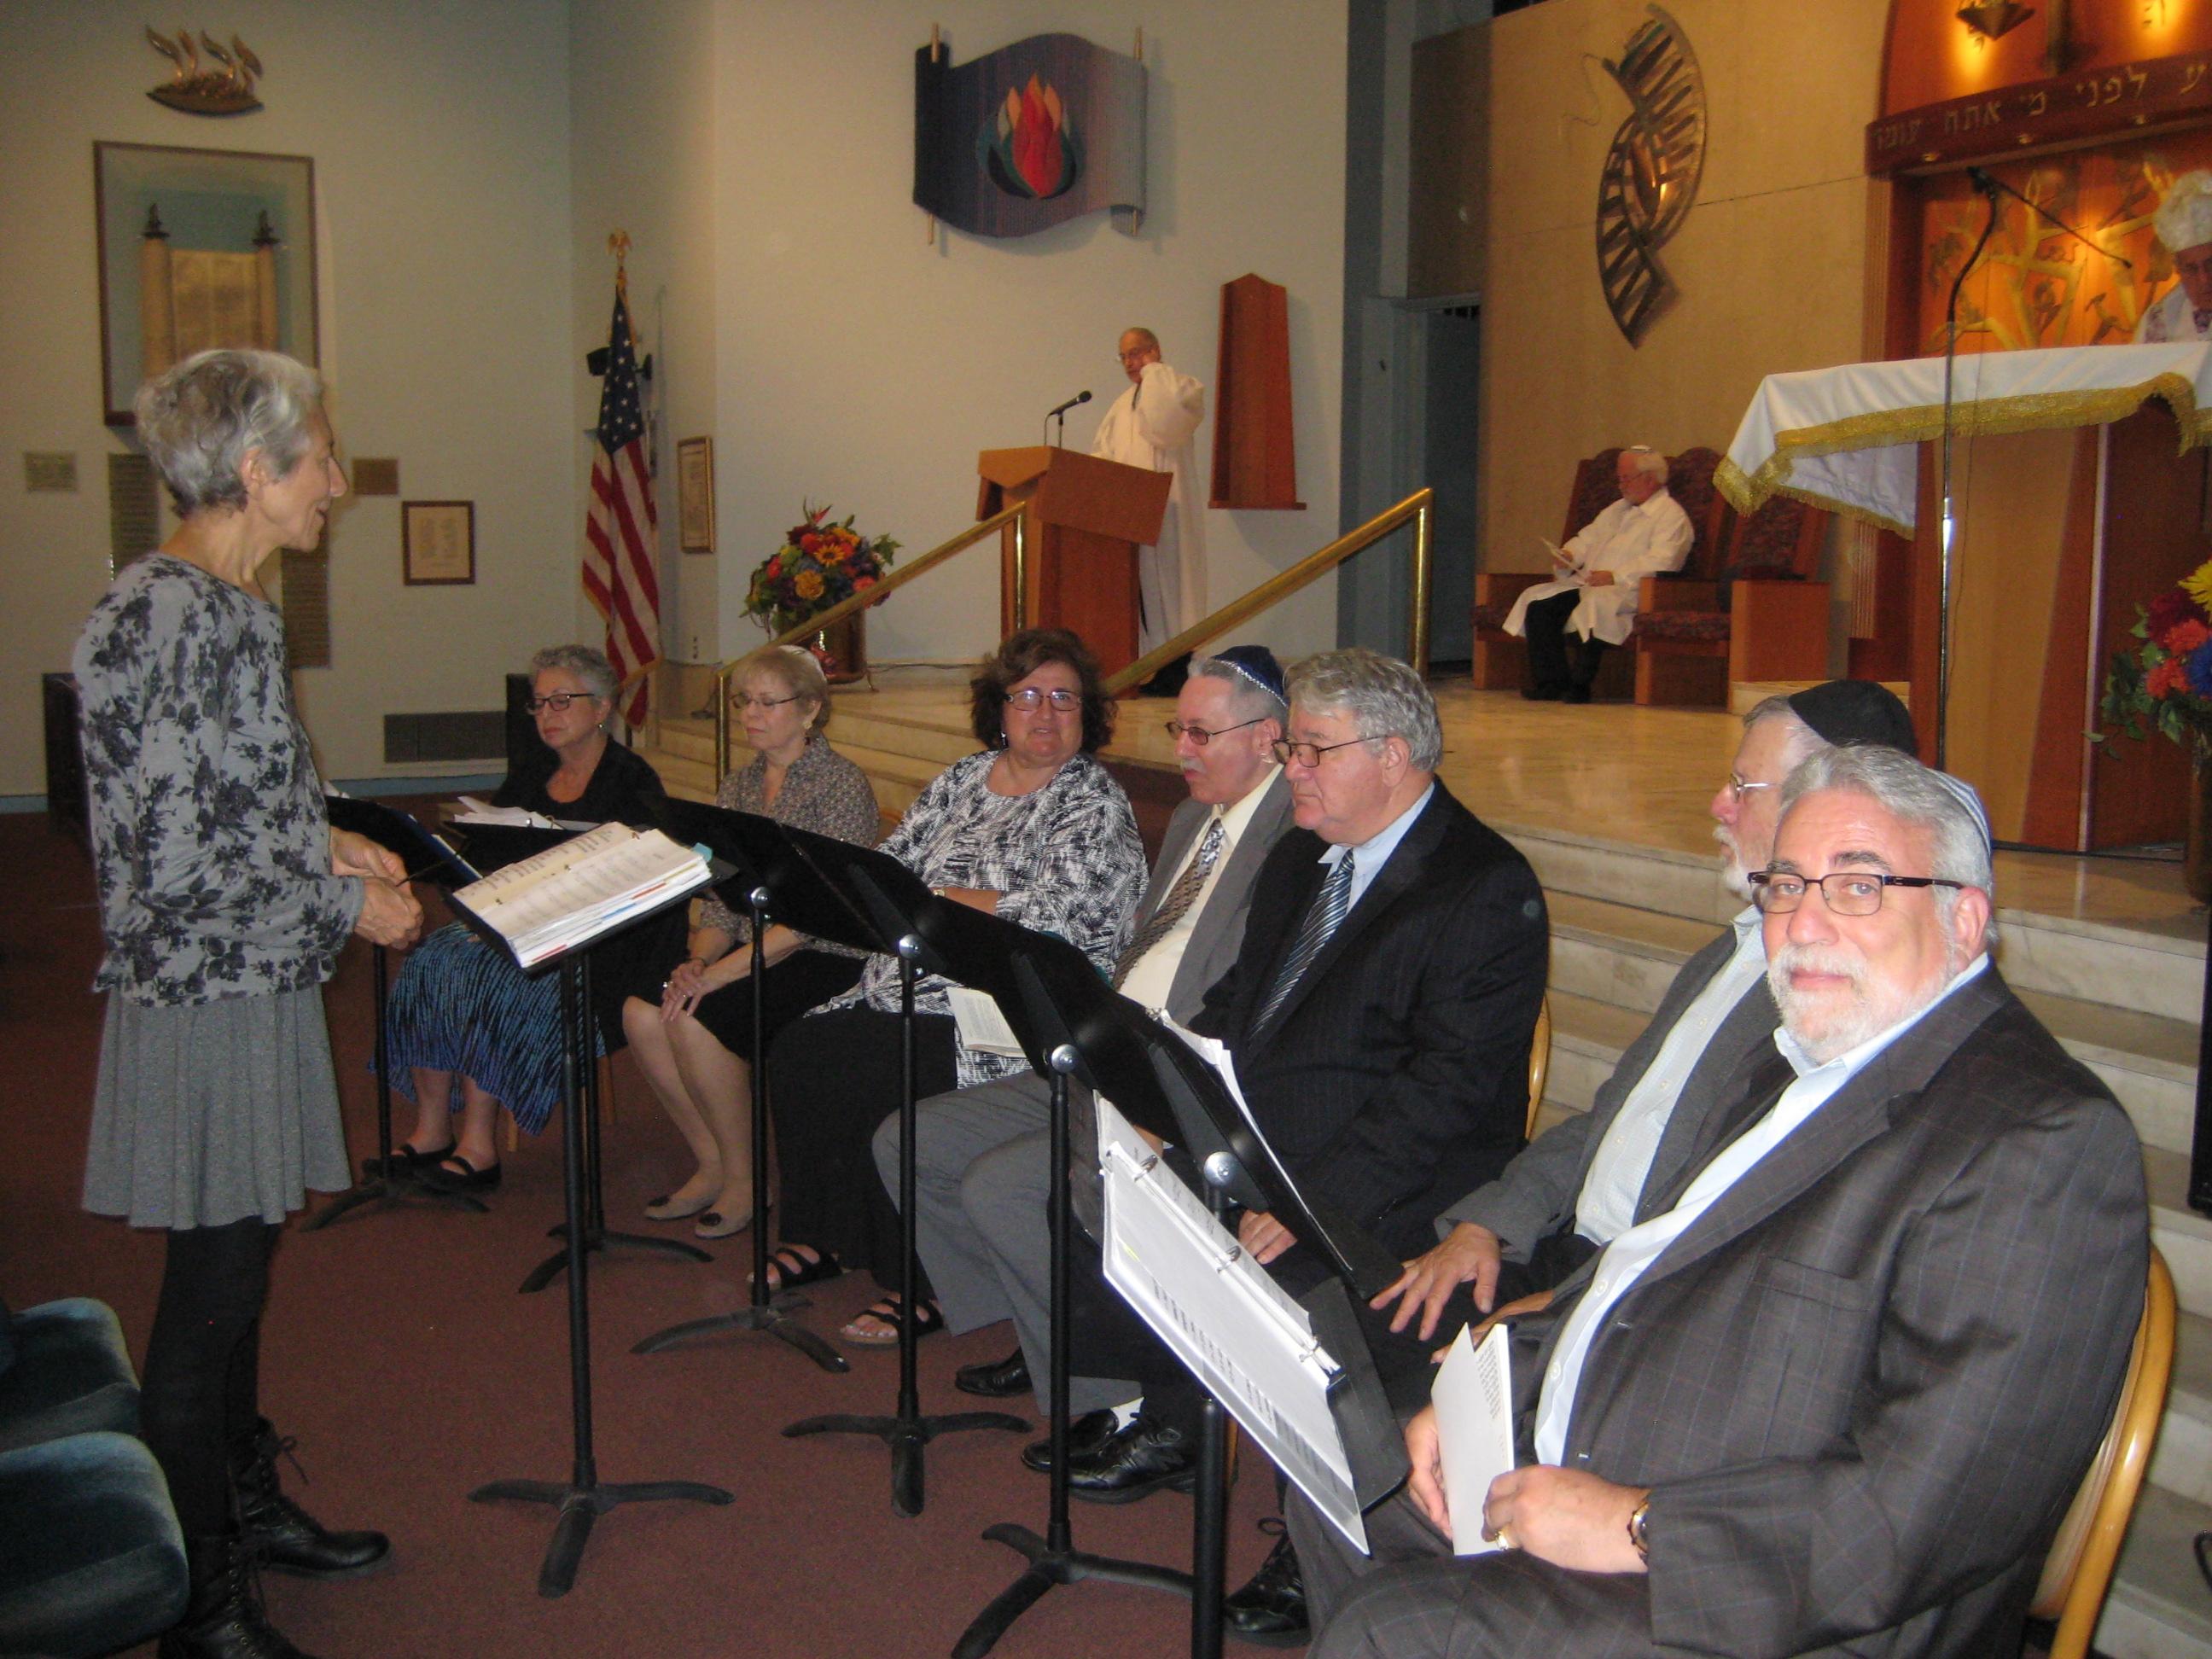 Slichot choir